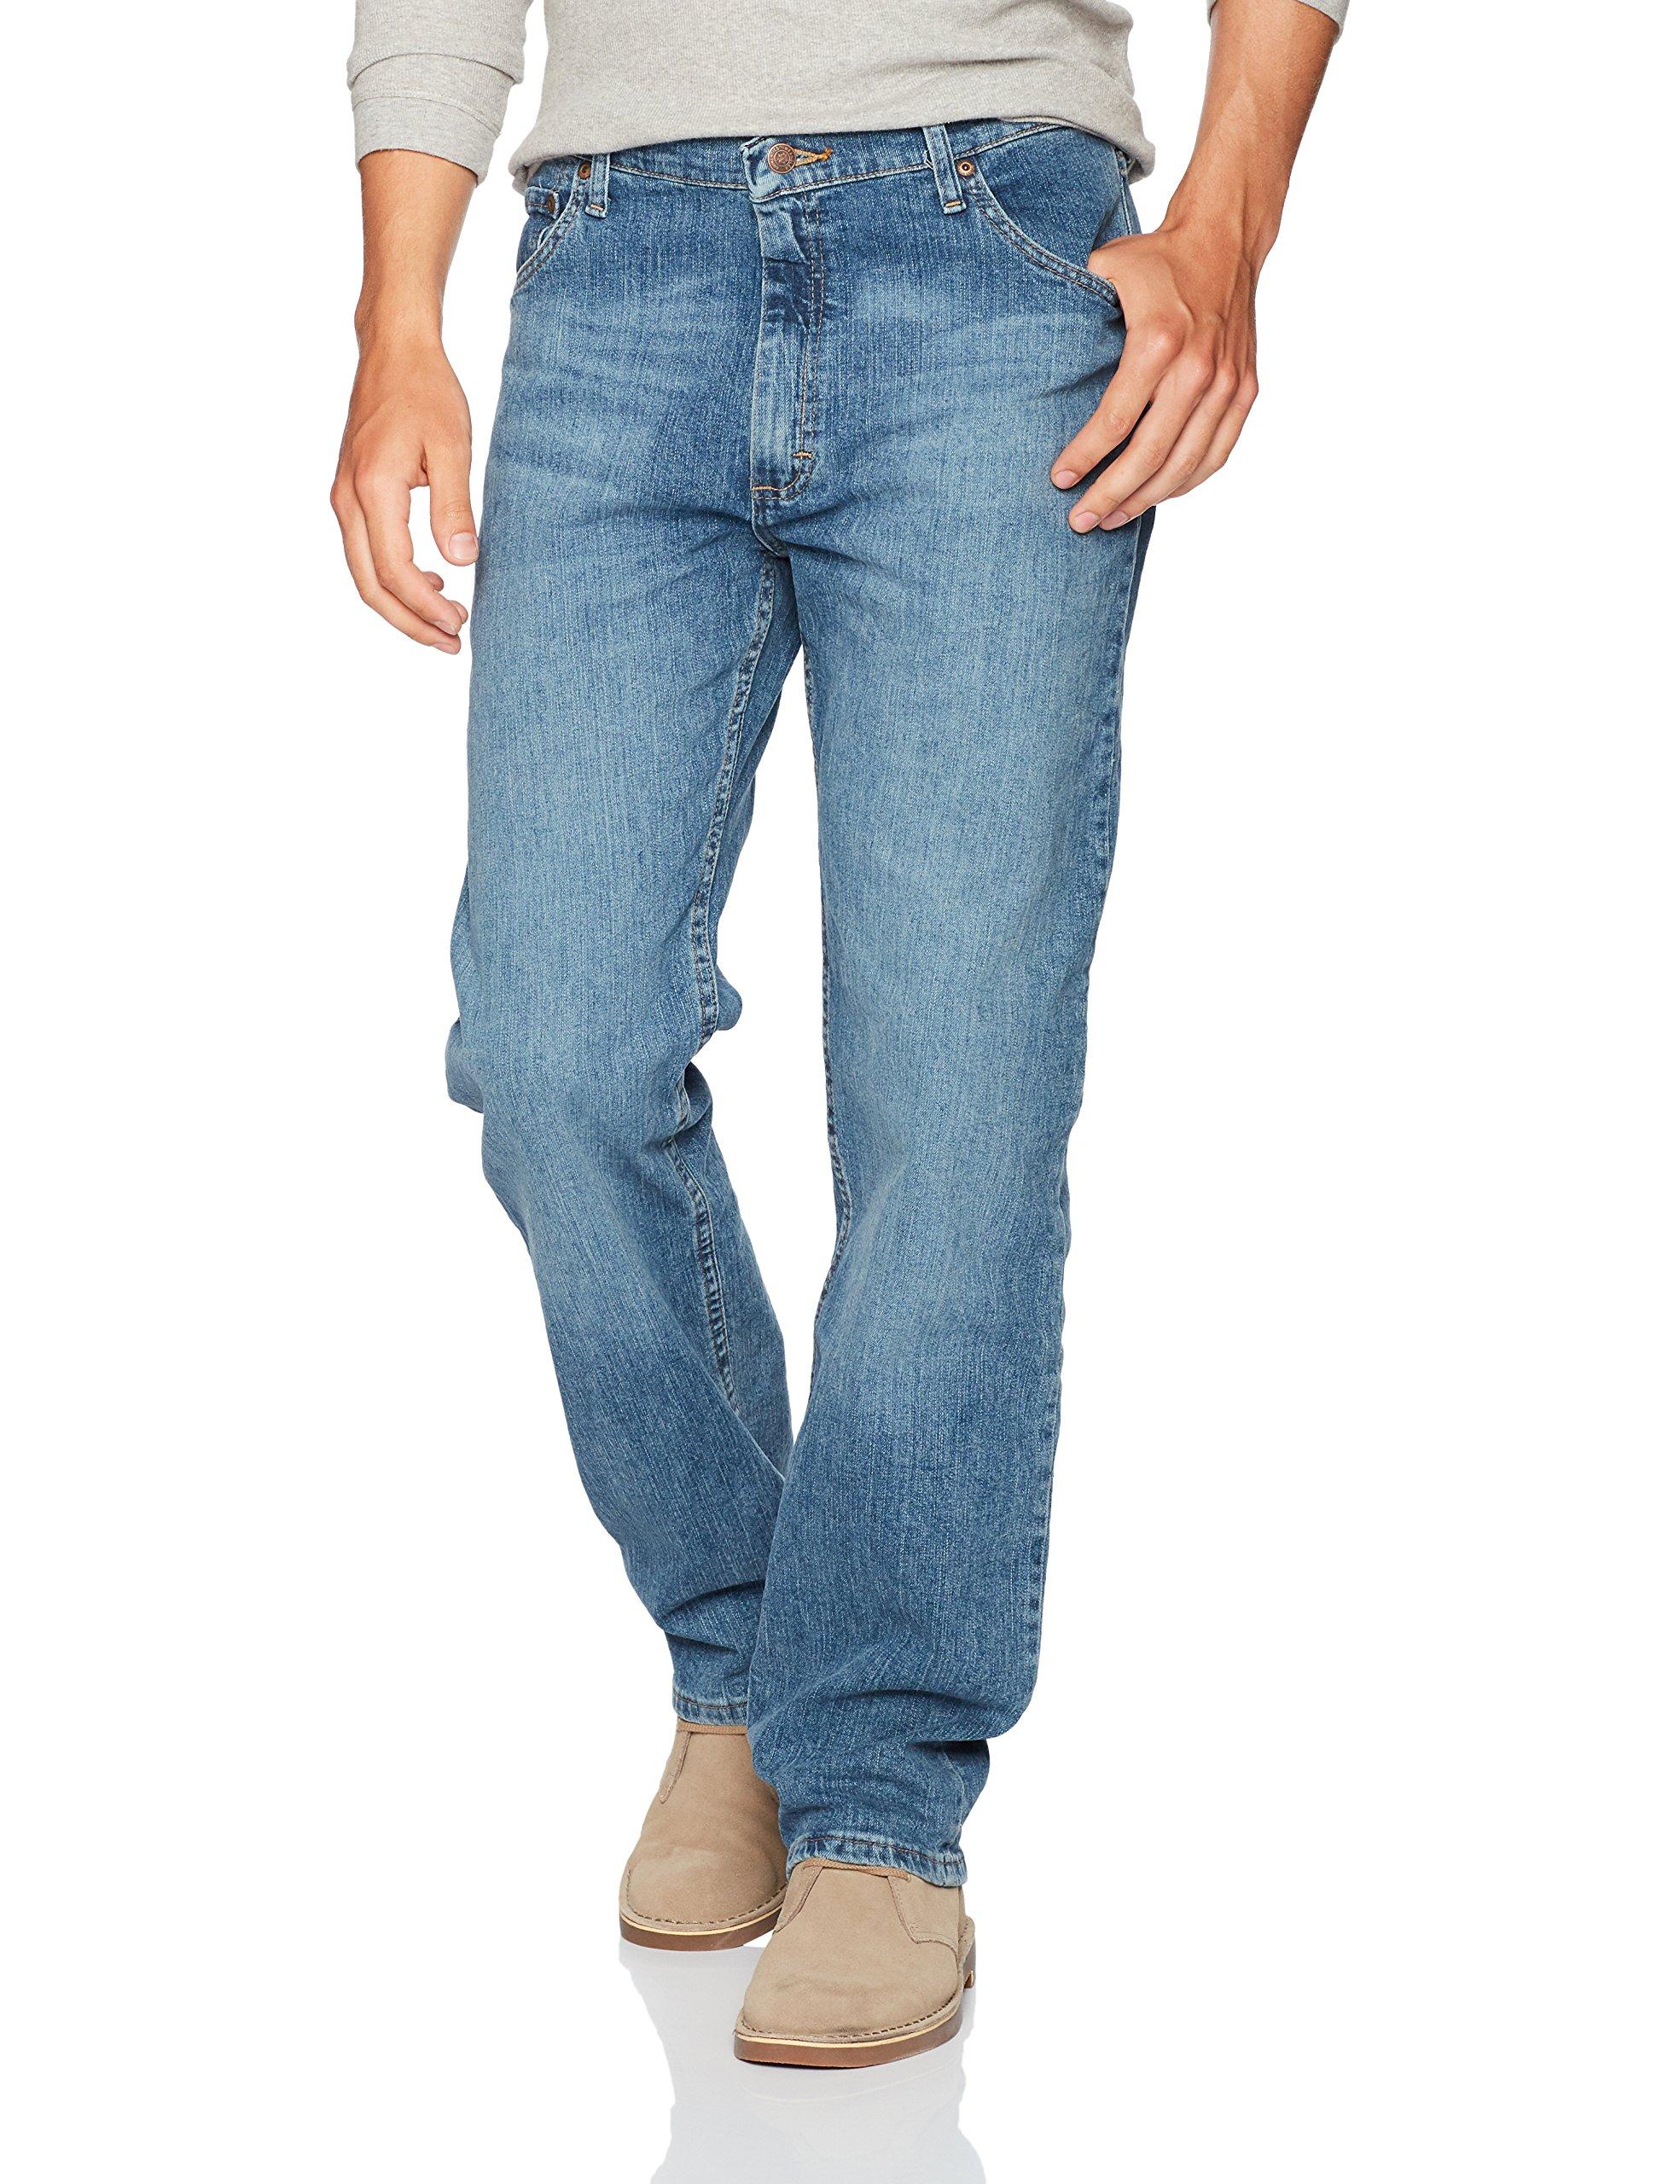 Wrangler Authentics Men's Classic 5-Pocket Regular Fit Jean,Vintage Blue Flex,36X32